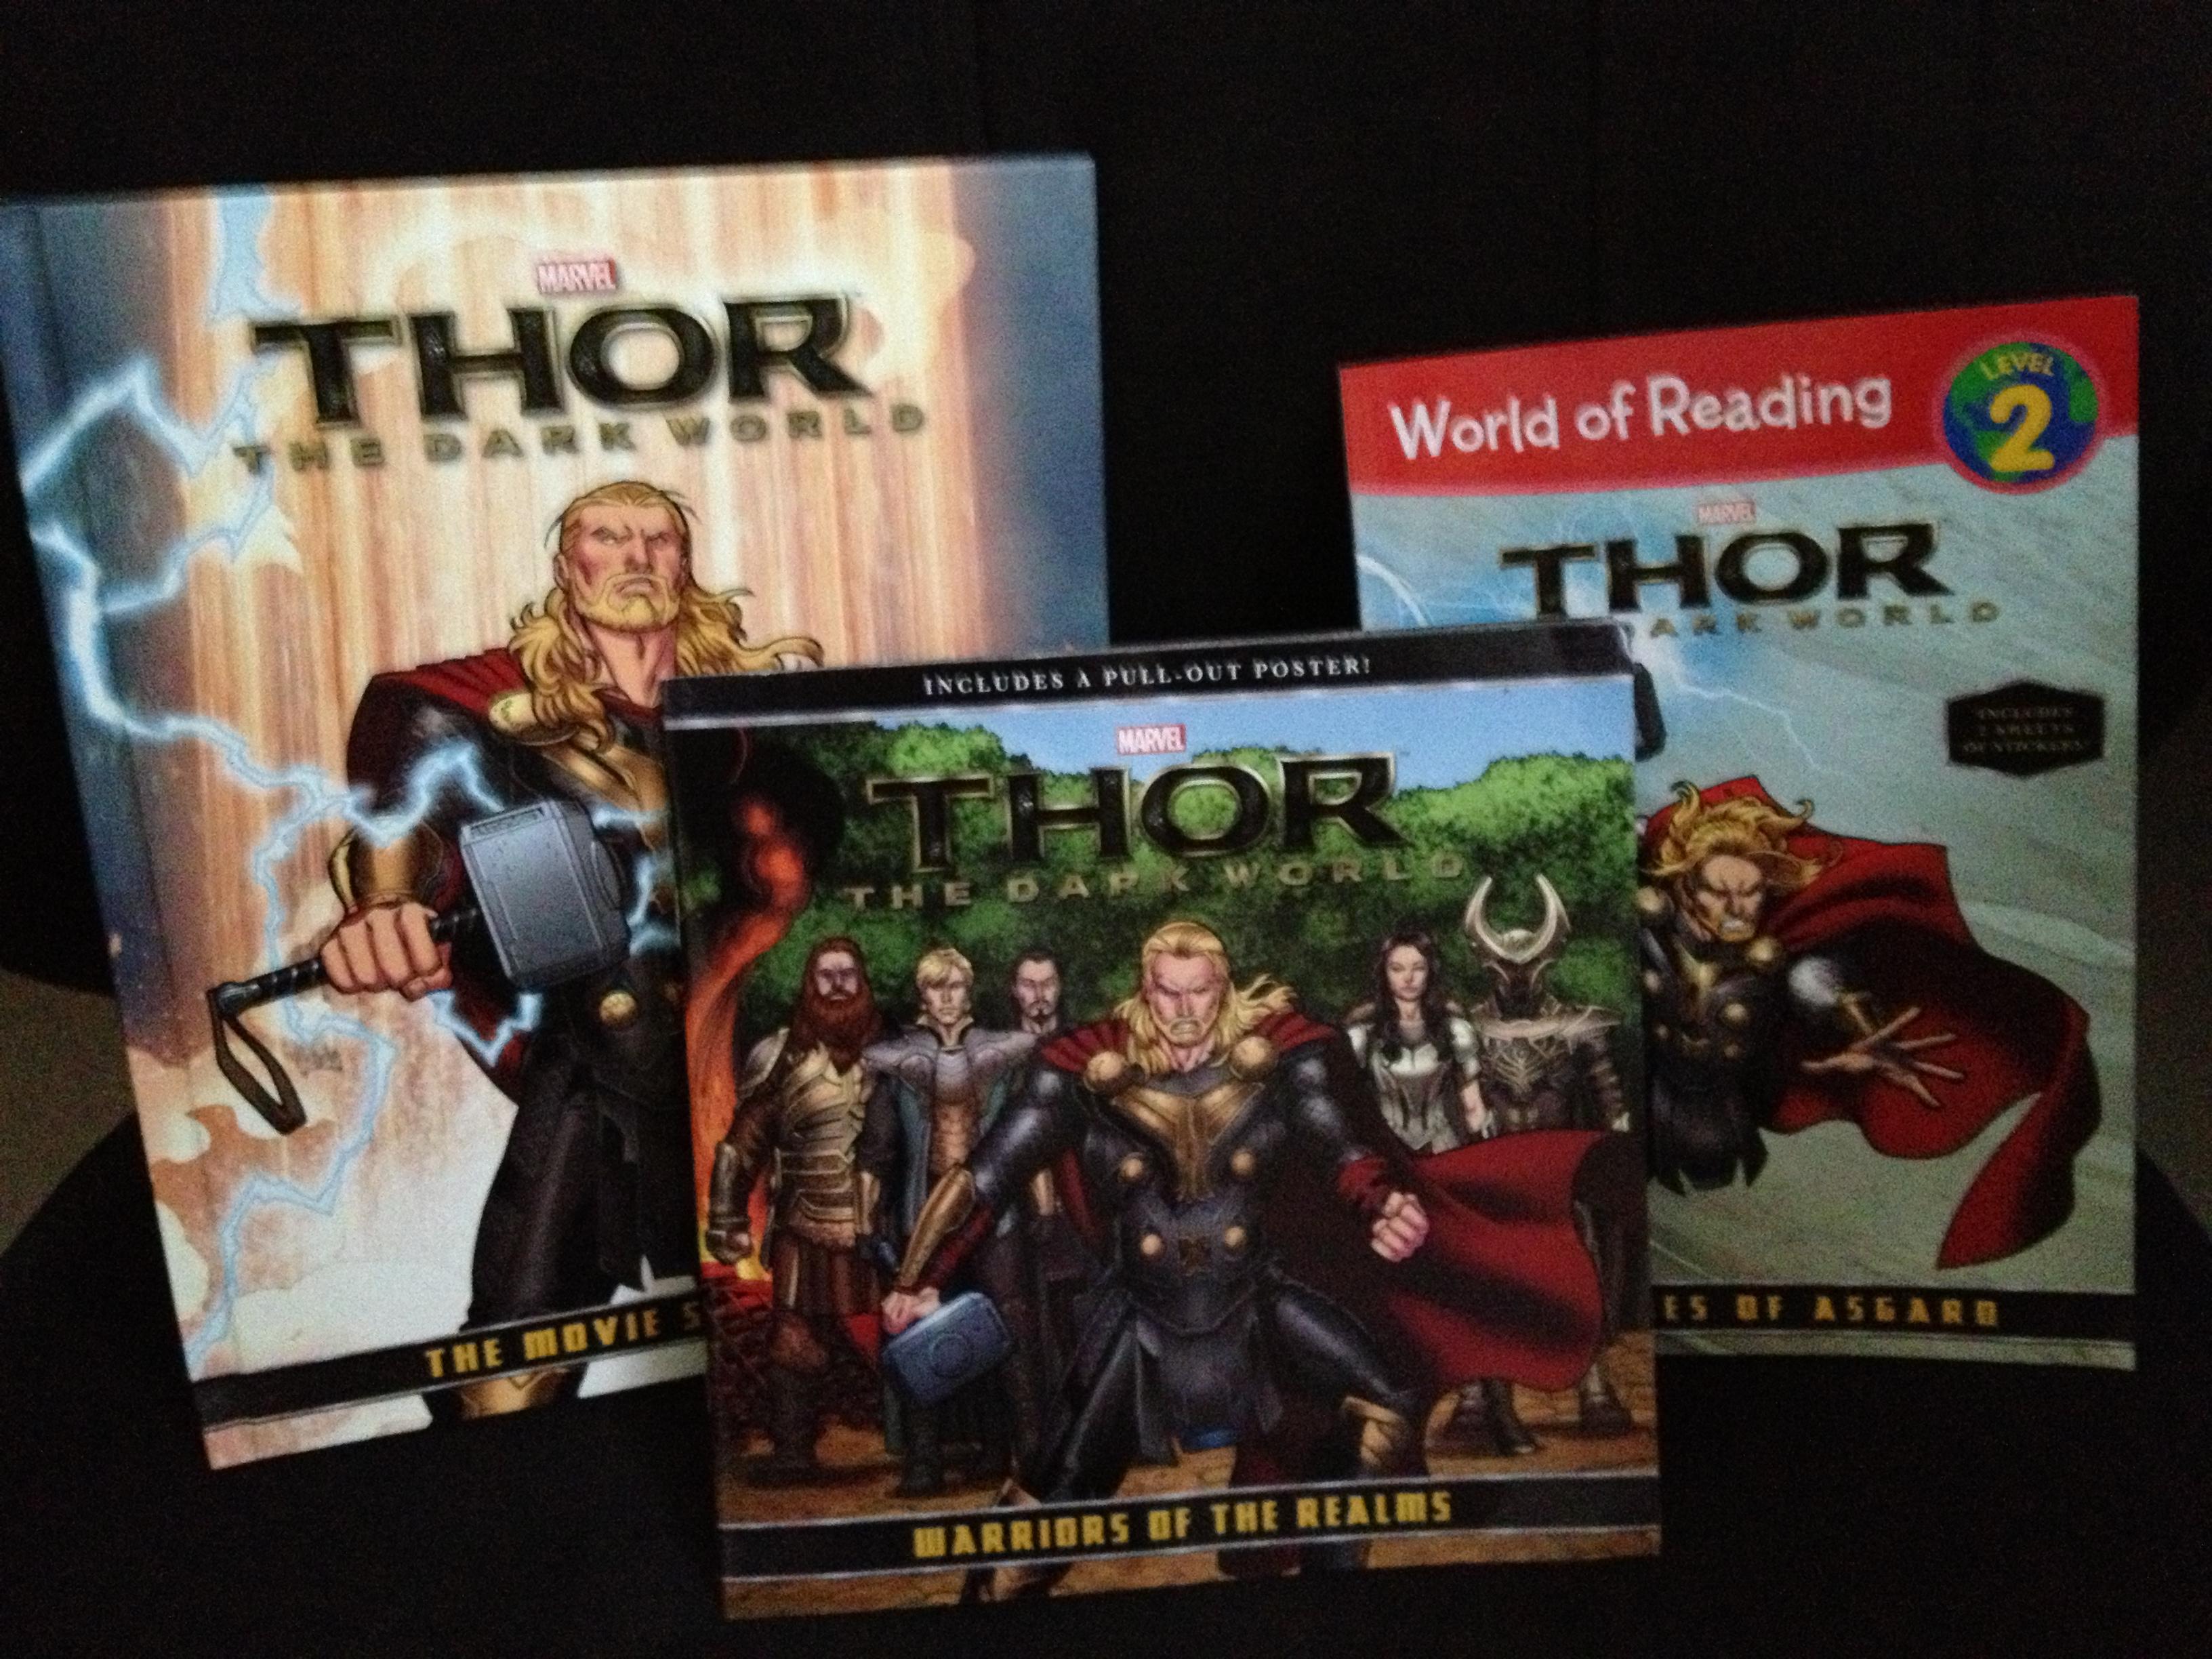 New Books for Thor The Dark World